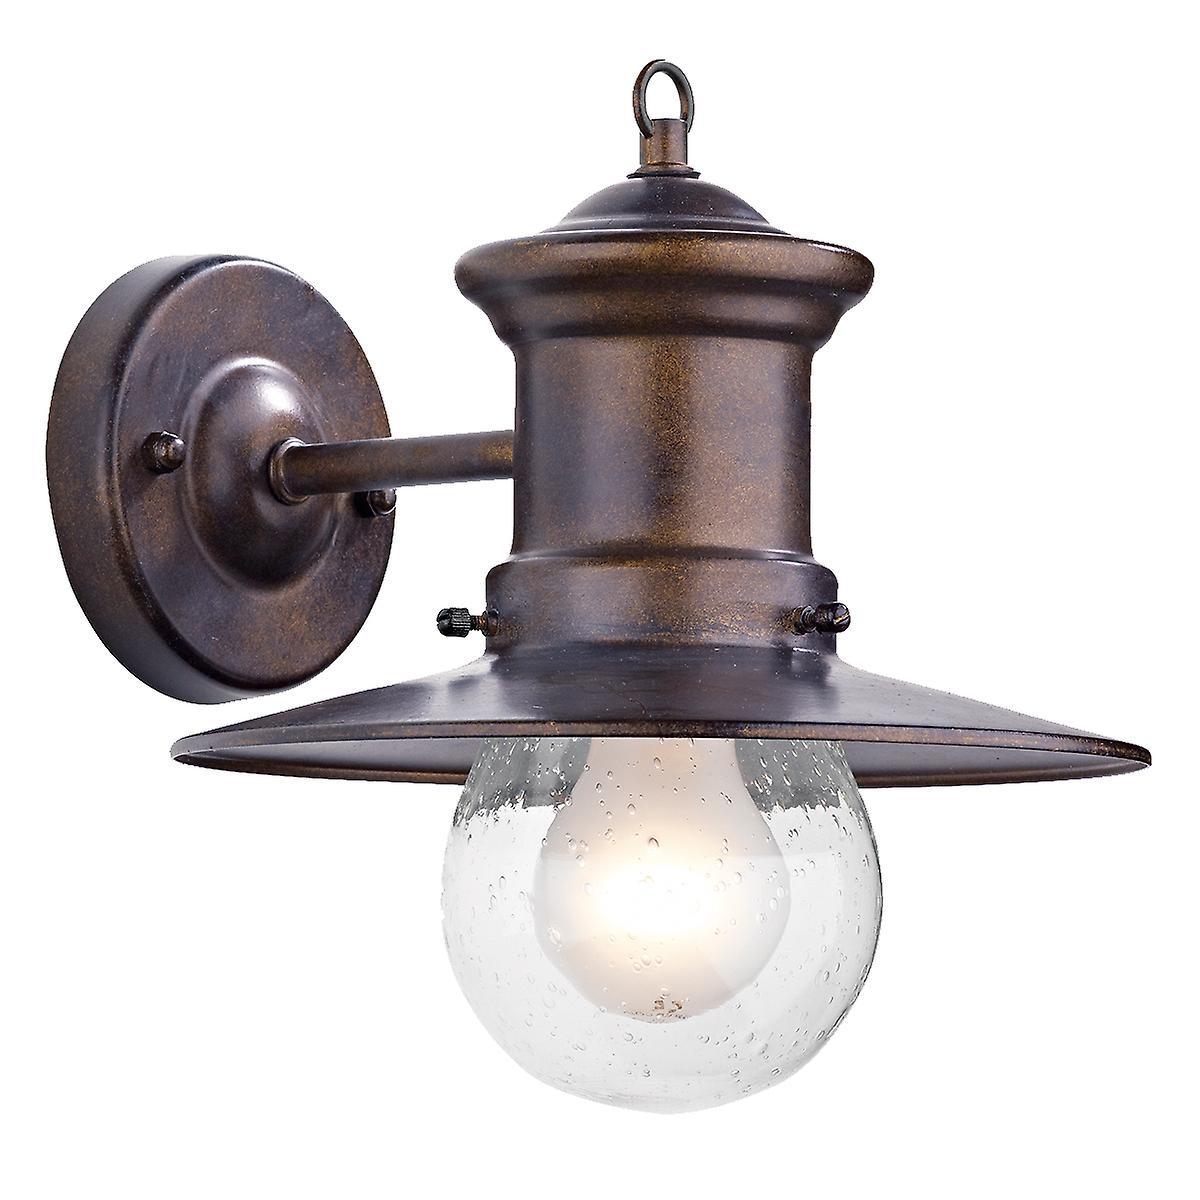 Dar SED1529 Sedgewick Single Light Lantern Bronze Down Facing Ip44